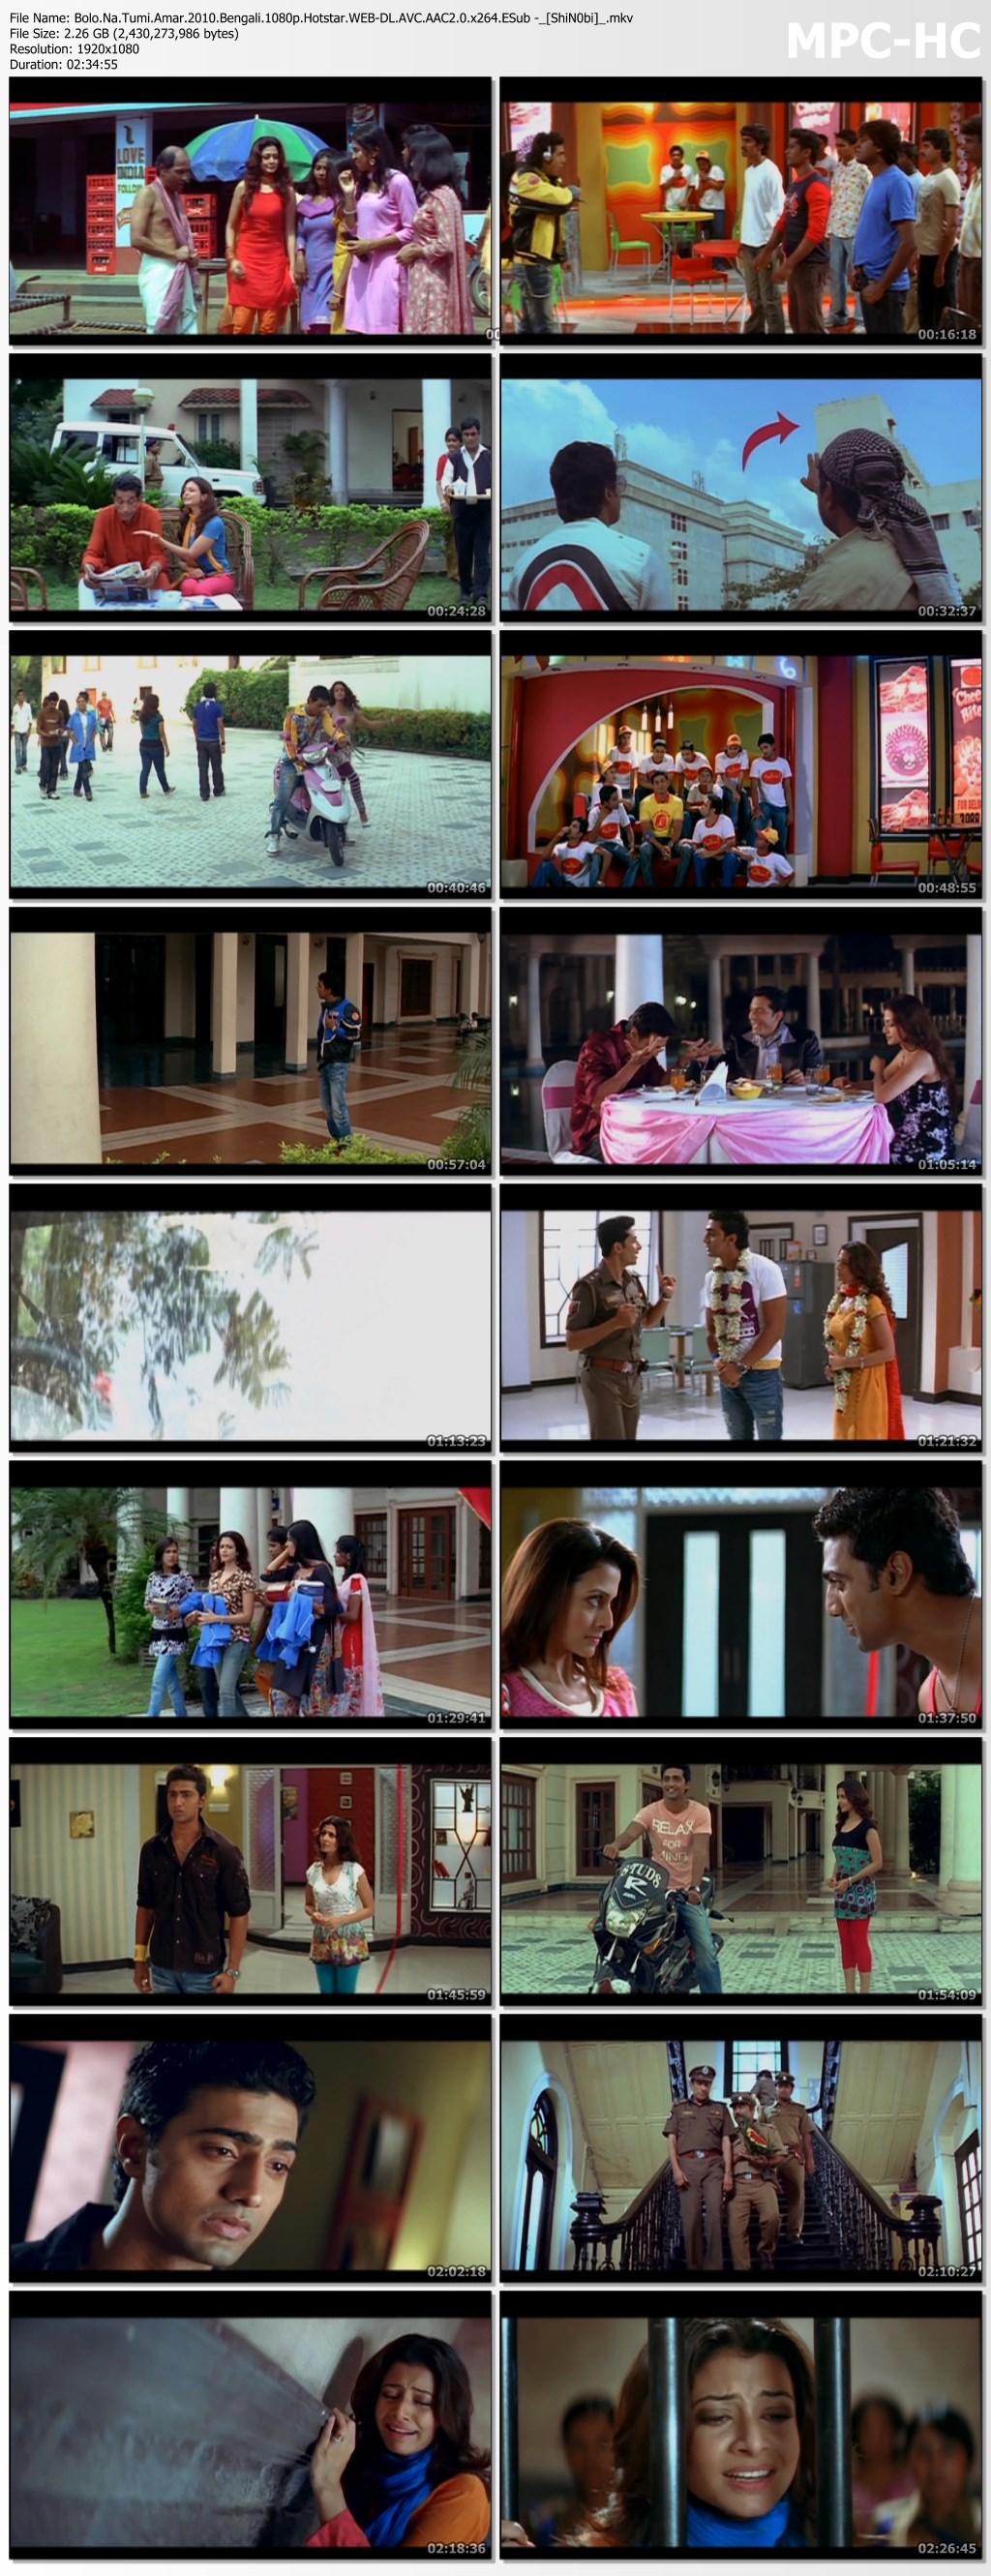 Bolo.Na.Tumi.Amar.2010.Bengali.1080p.Hotstar.WEB DL.AVC.AAC2.0.x264.ESub [ShiN0bi] .mkv thumbs